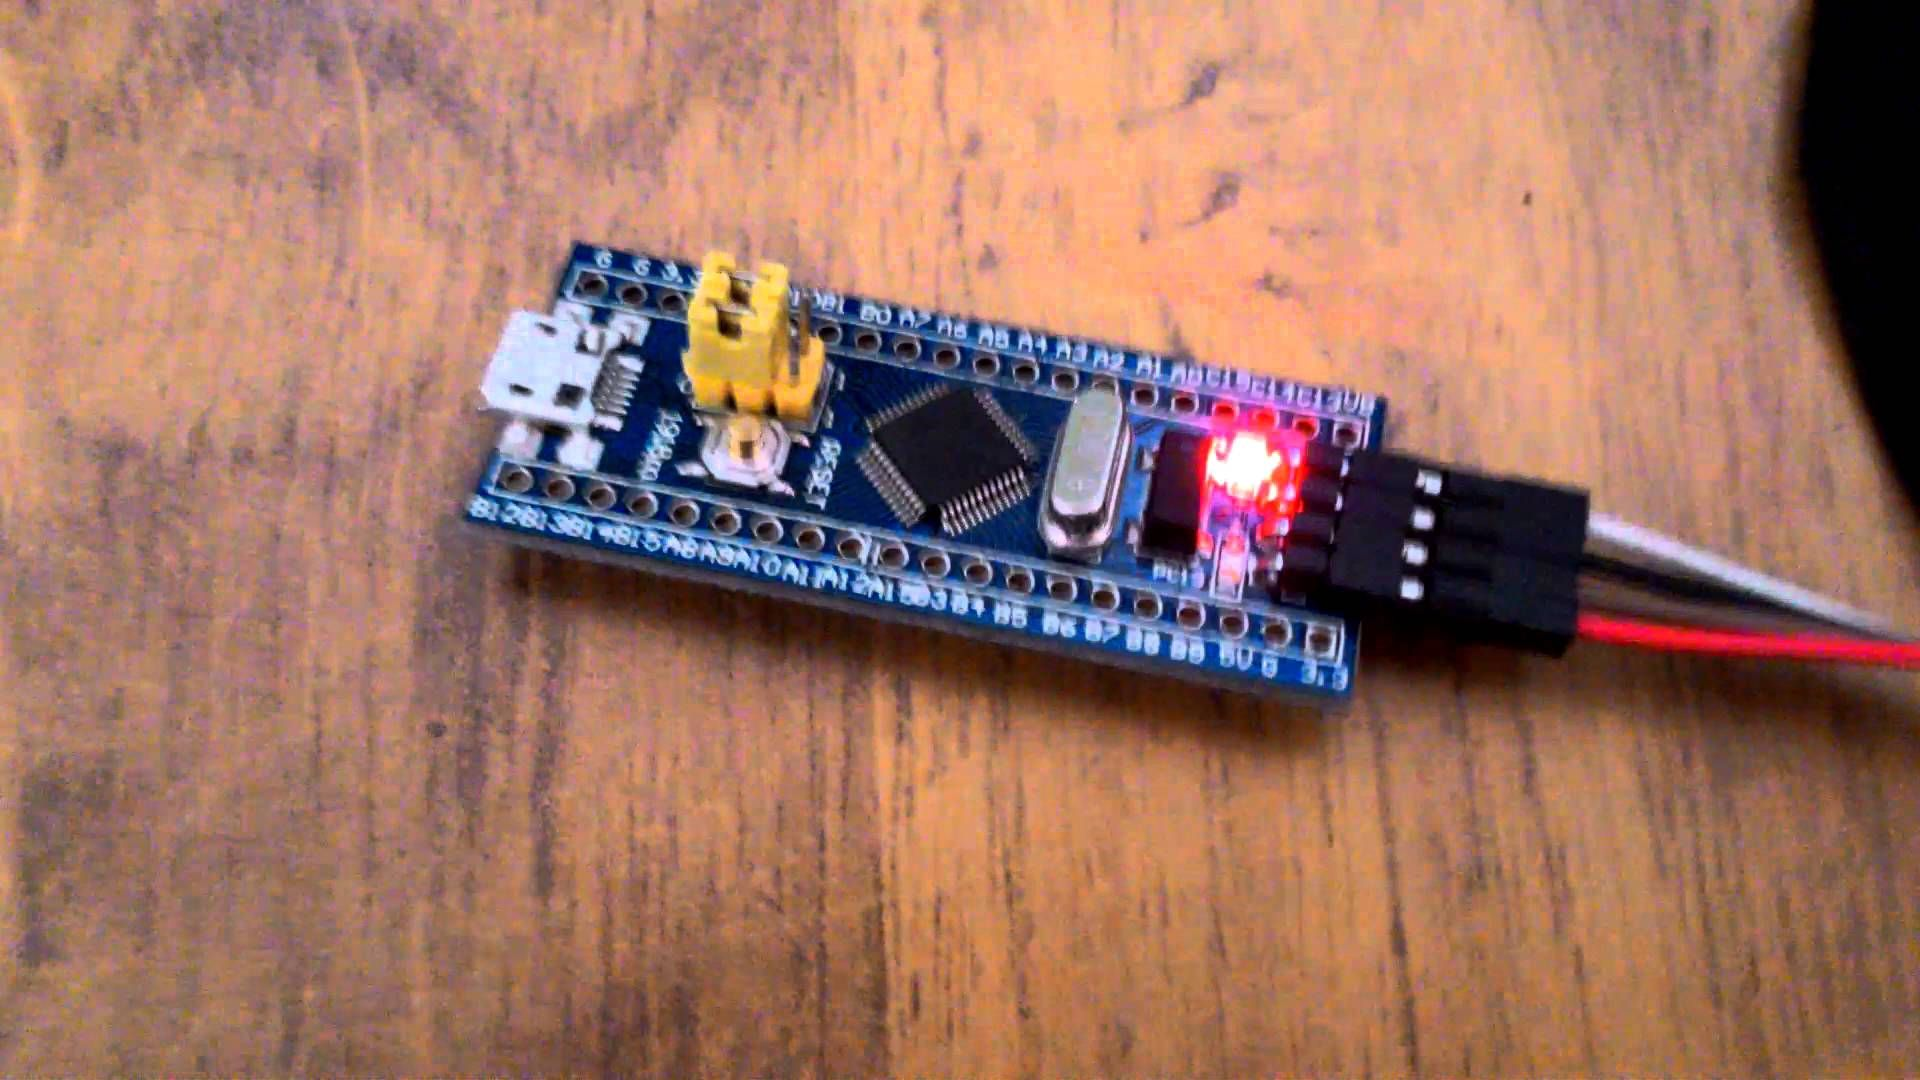 Programming Generic STM32 board via Arduino IDE and ST-Link V2